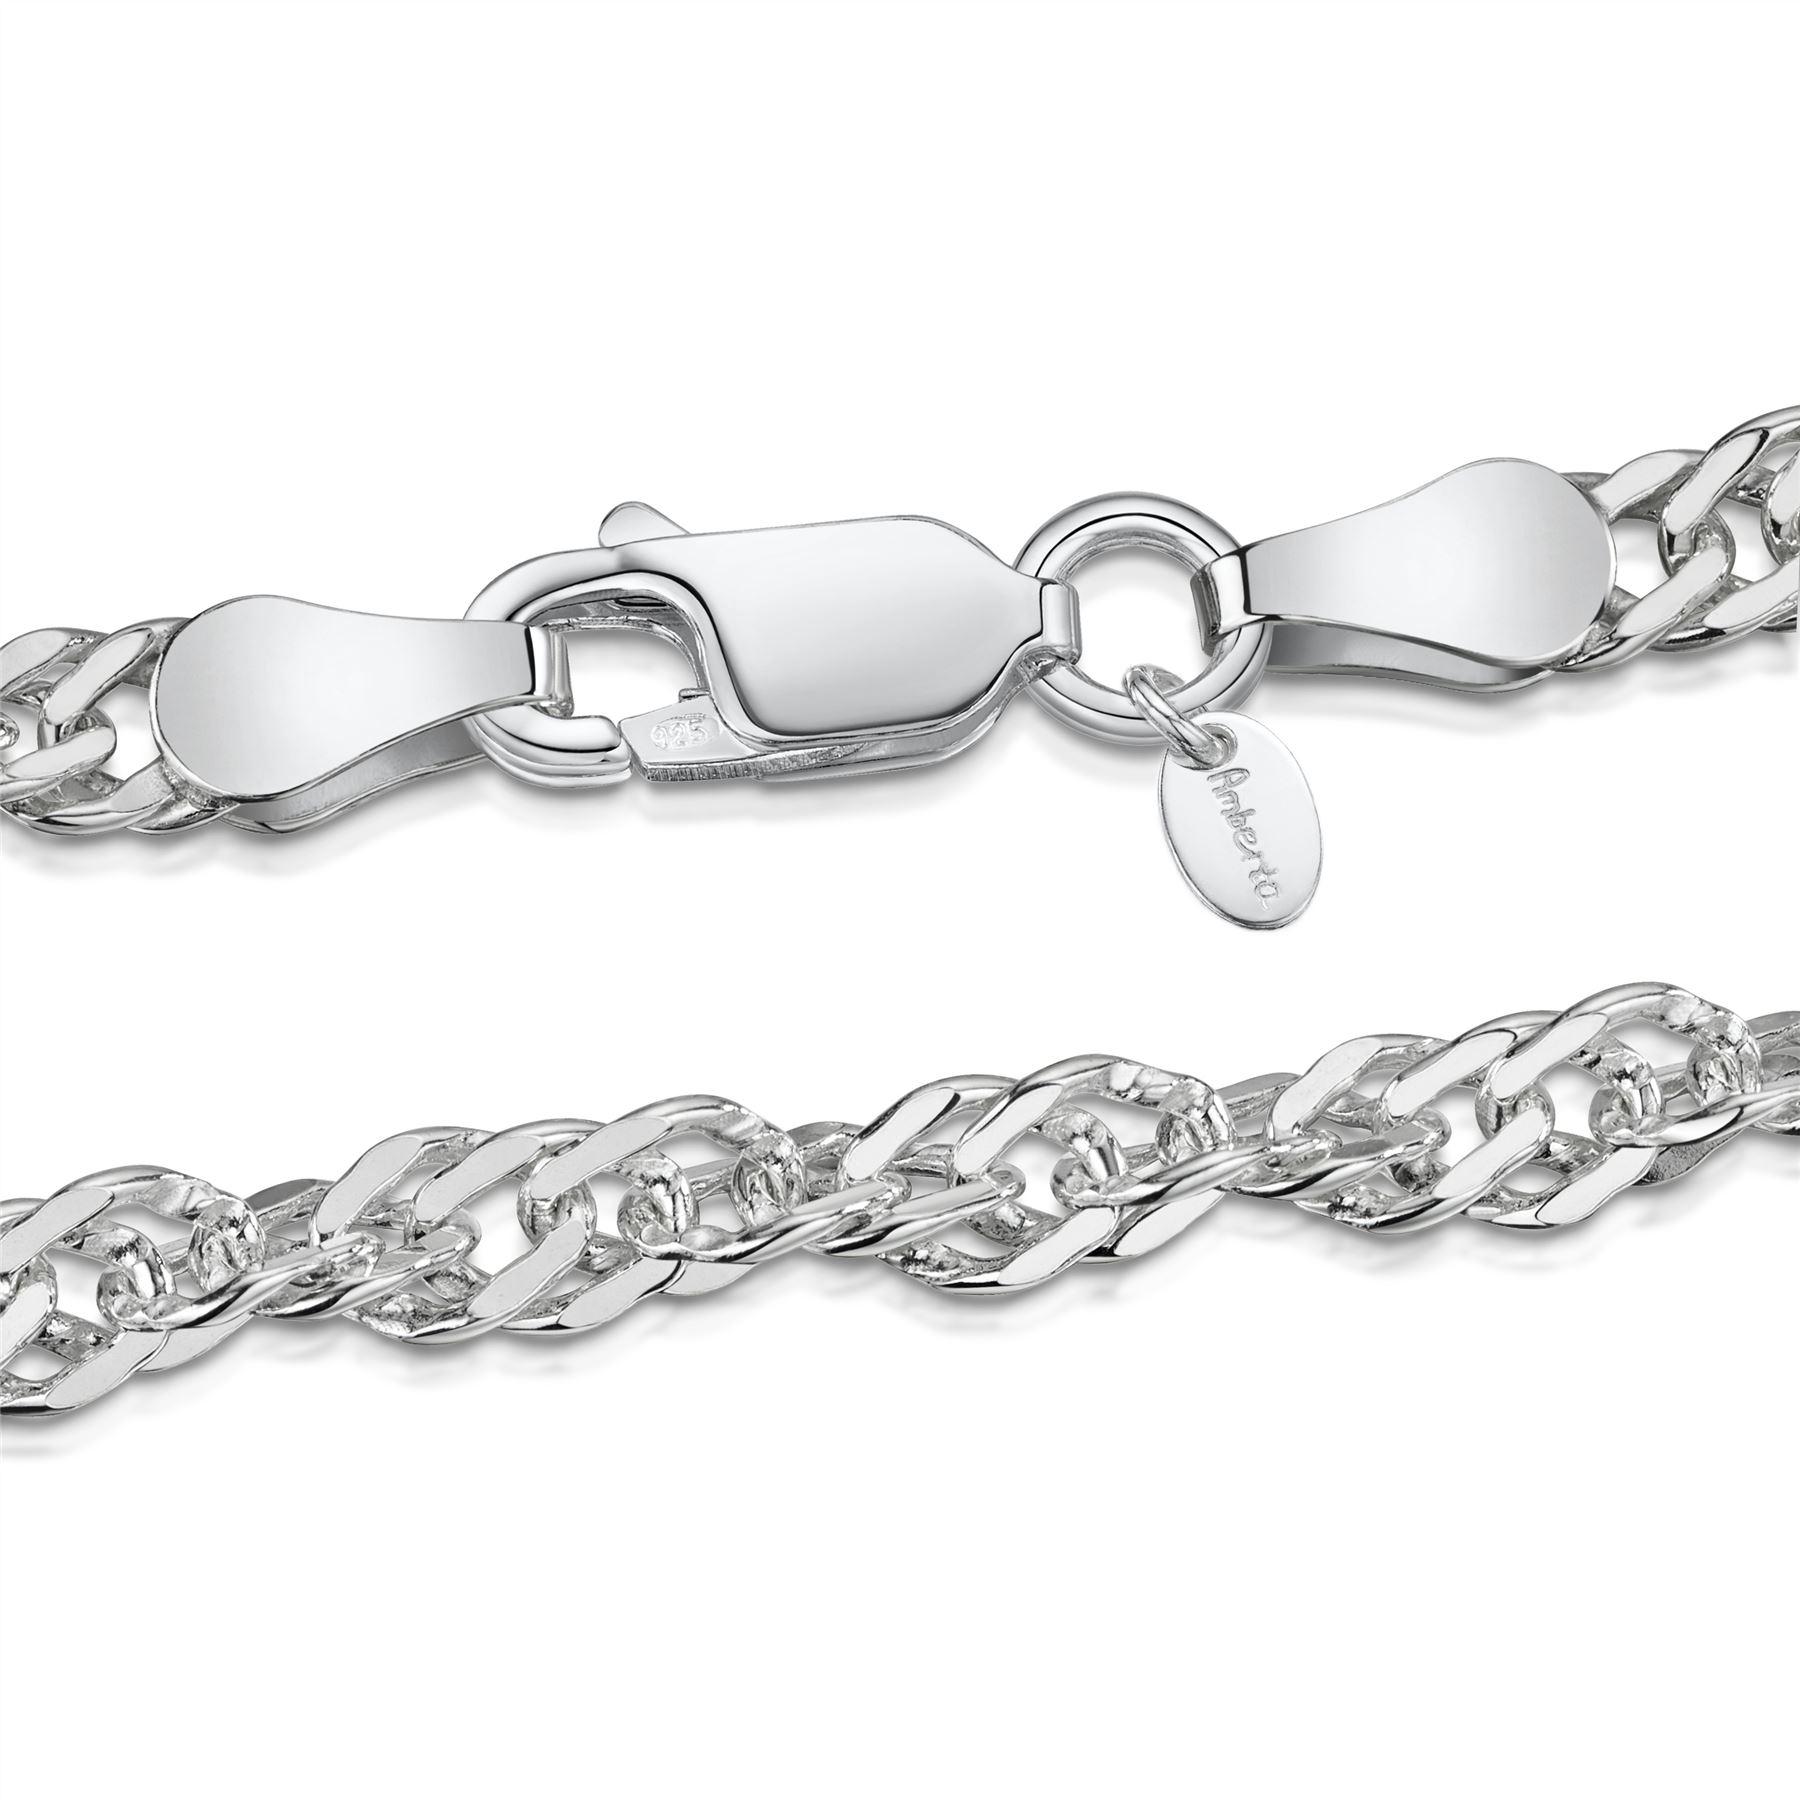 Amberta-Jewelry-925-Sterling-Silver-Adjustable-Anklet-Foot-Bracelet-for-Women miniature 47